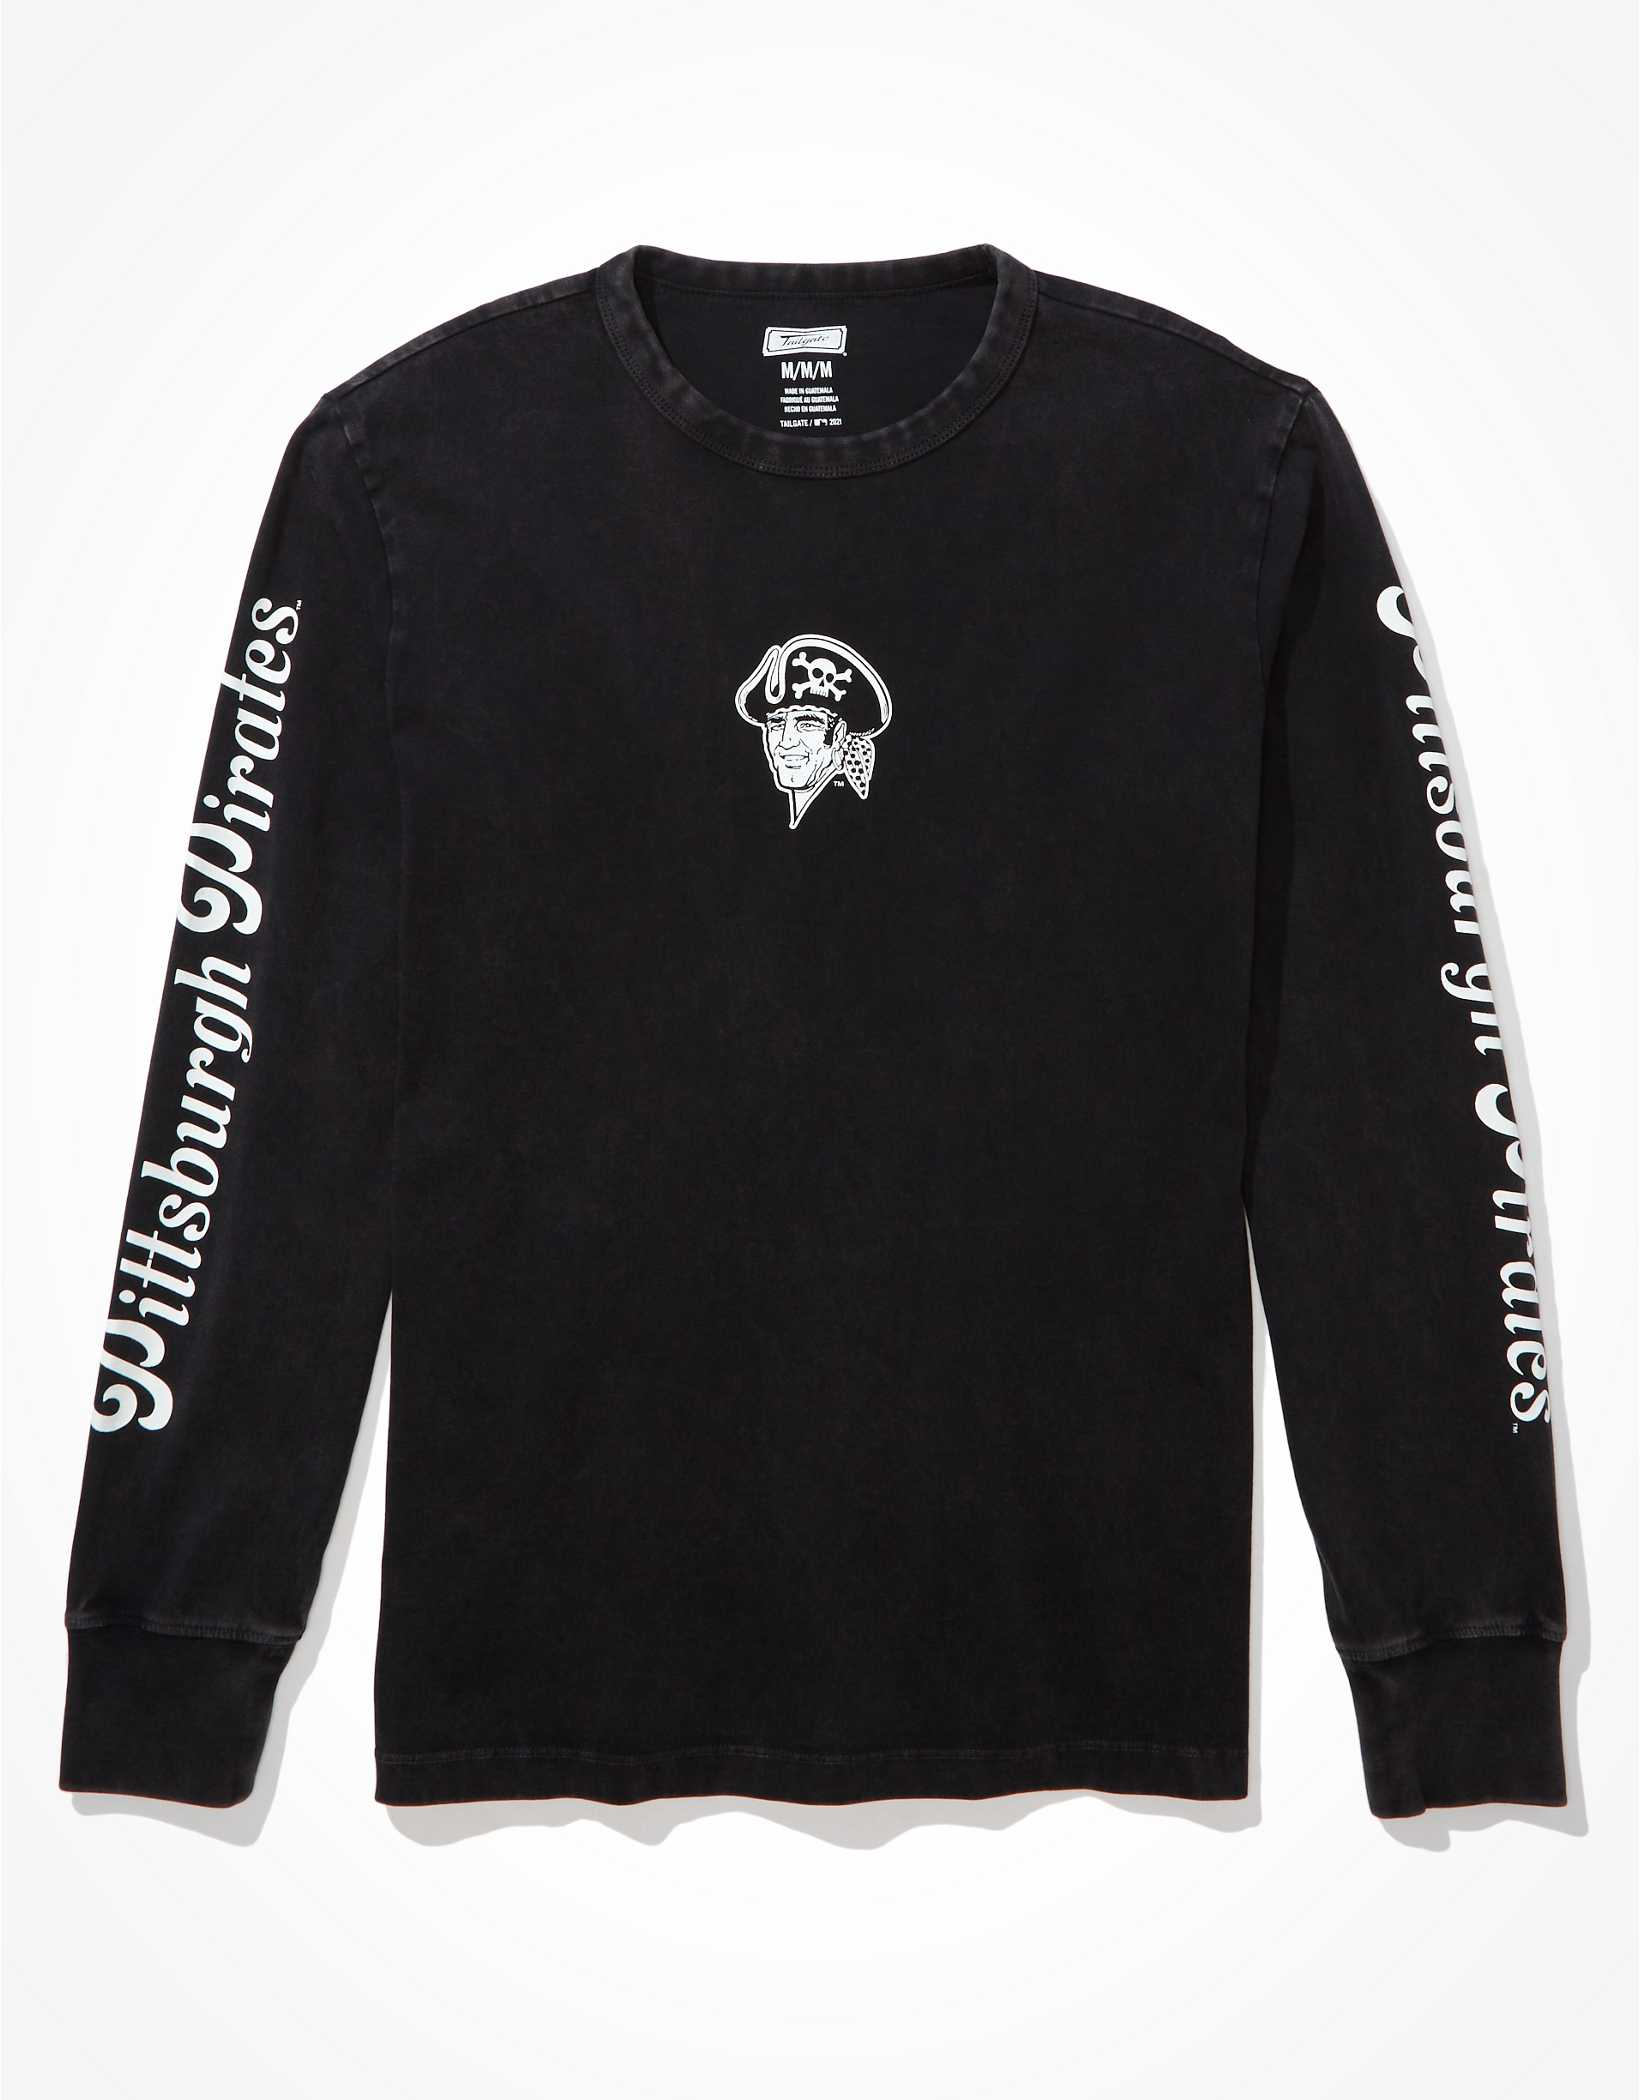 Tailgate Men's Pittsburgh Pirates Long-Sleeve Graphic T-Shirt